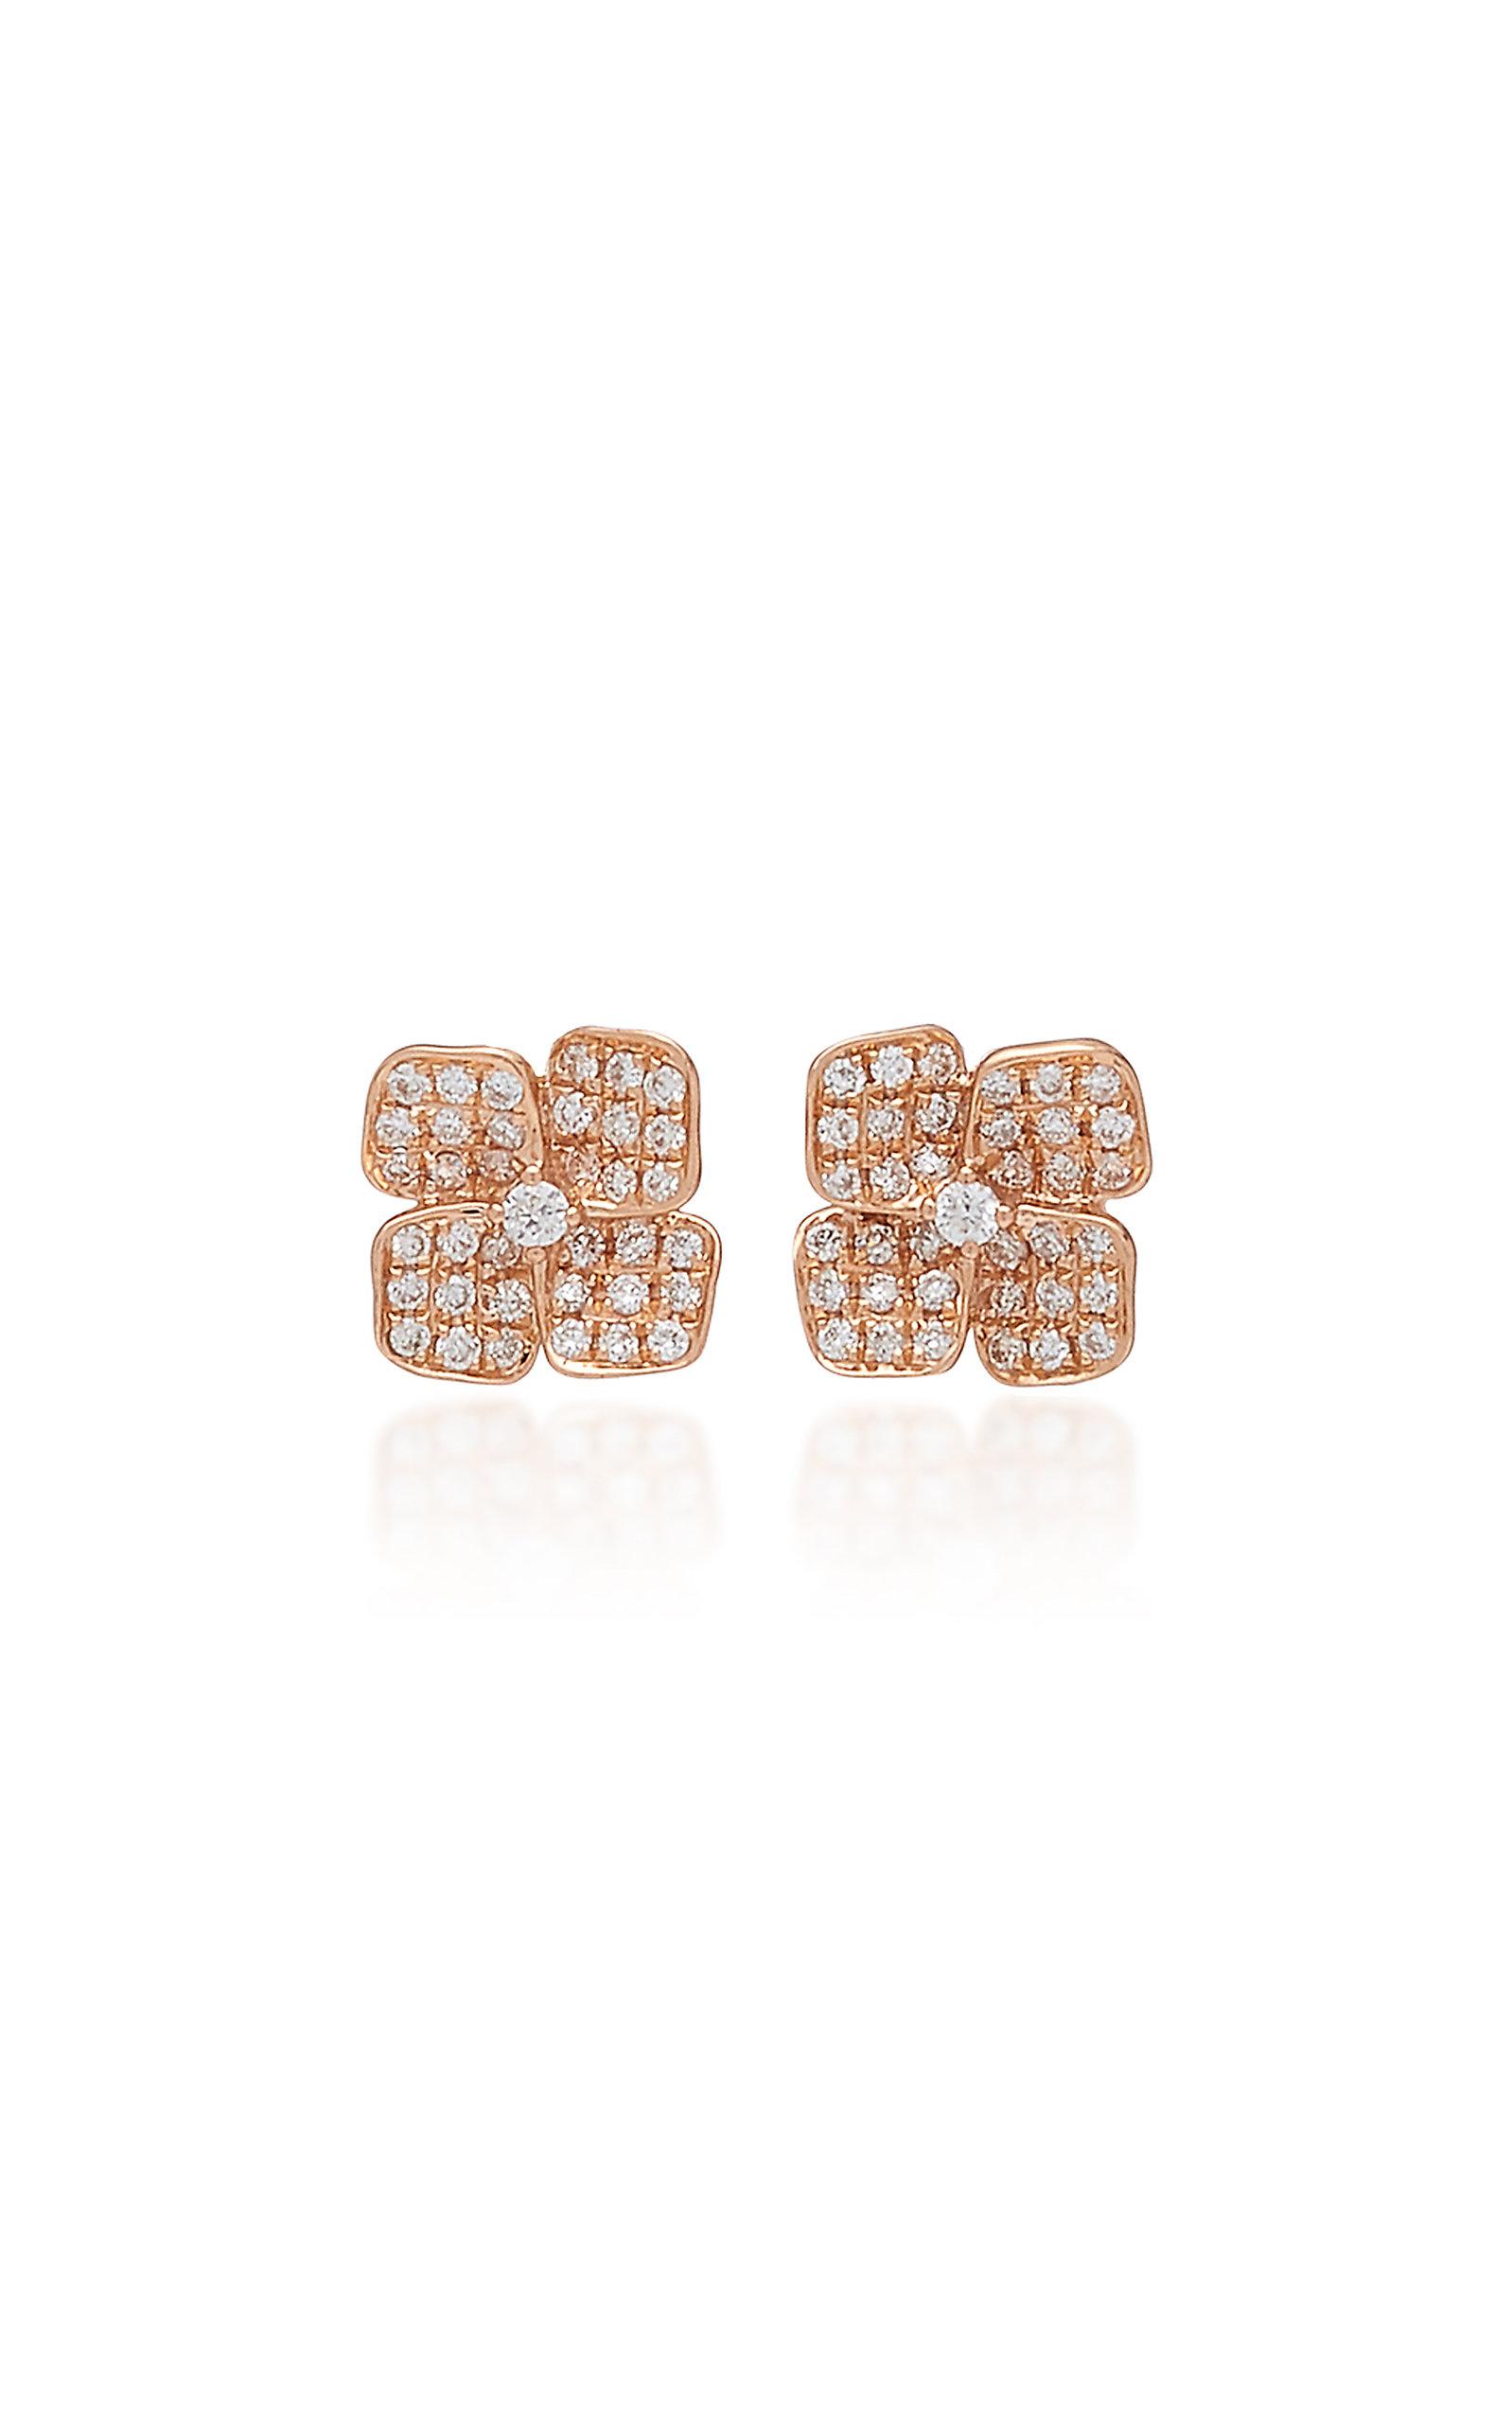 a521deea7 Floral 18K Gold And Diamond Stud Earrings by Anita Ko | Moda Operandi